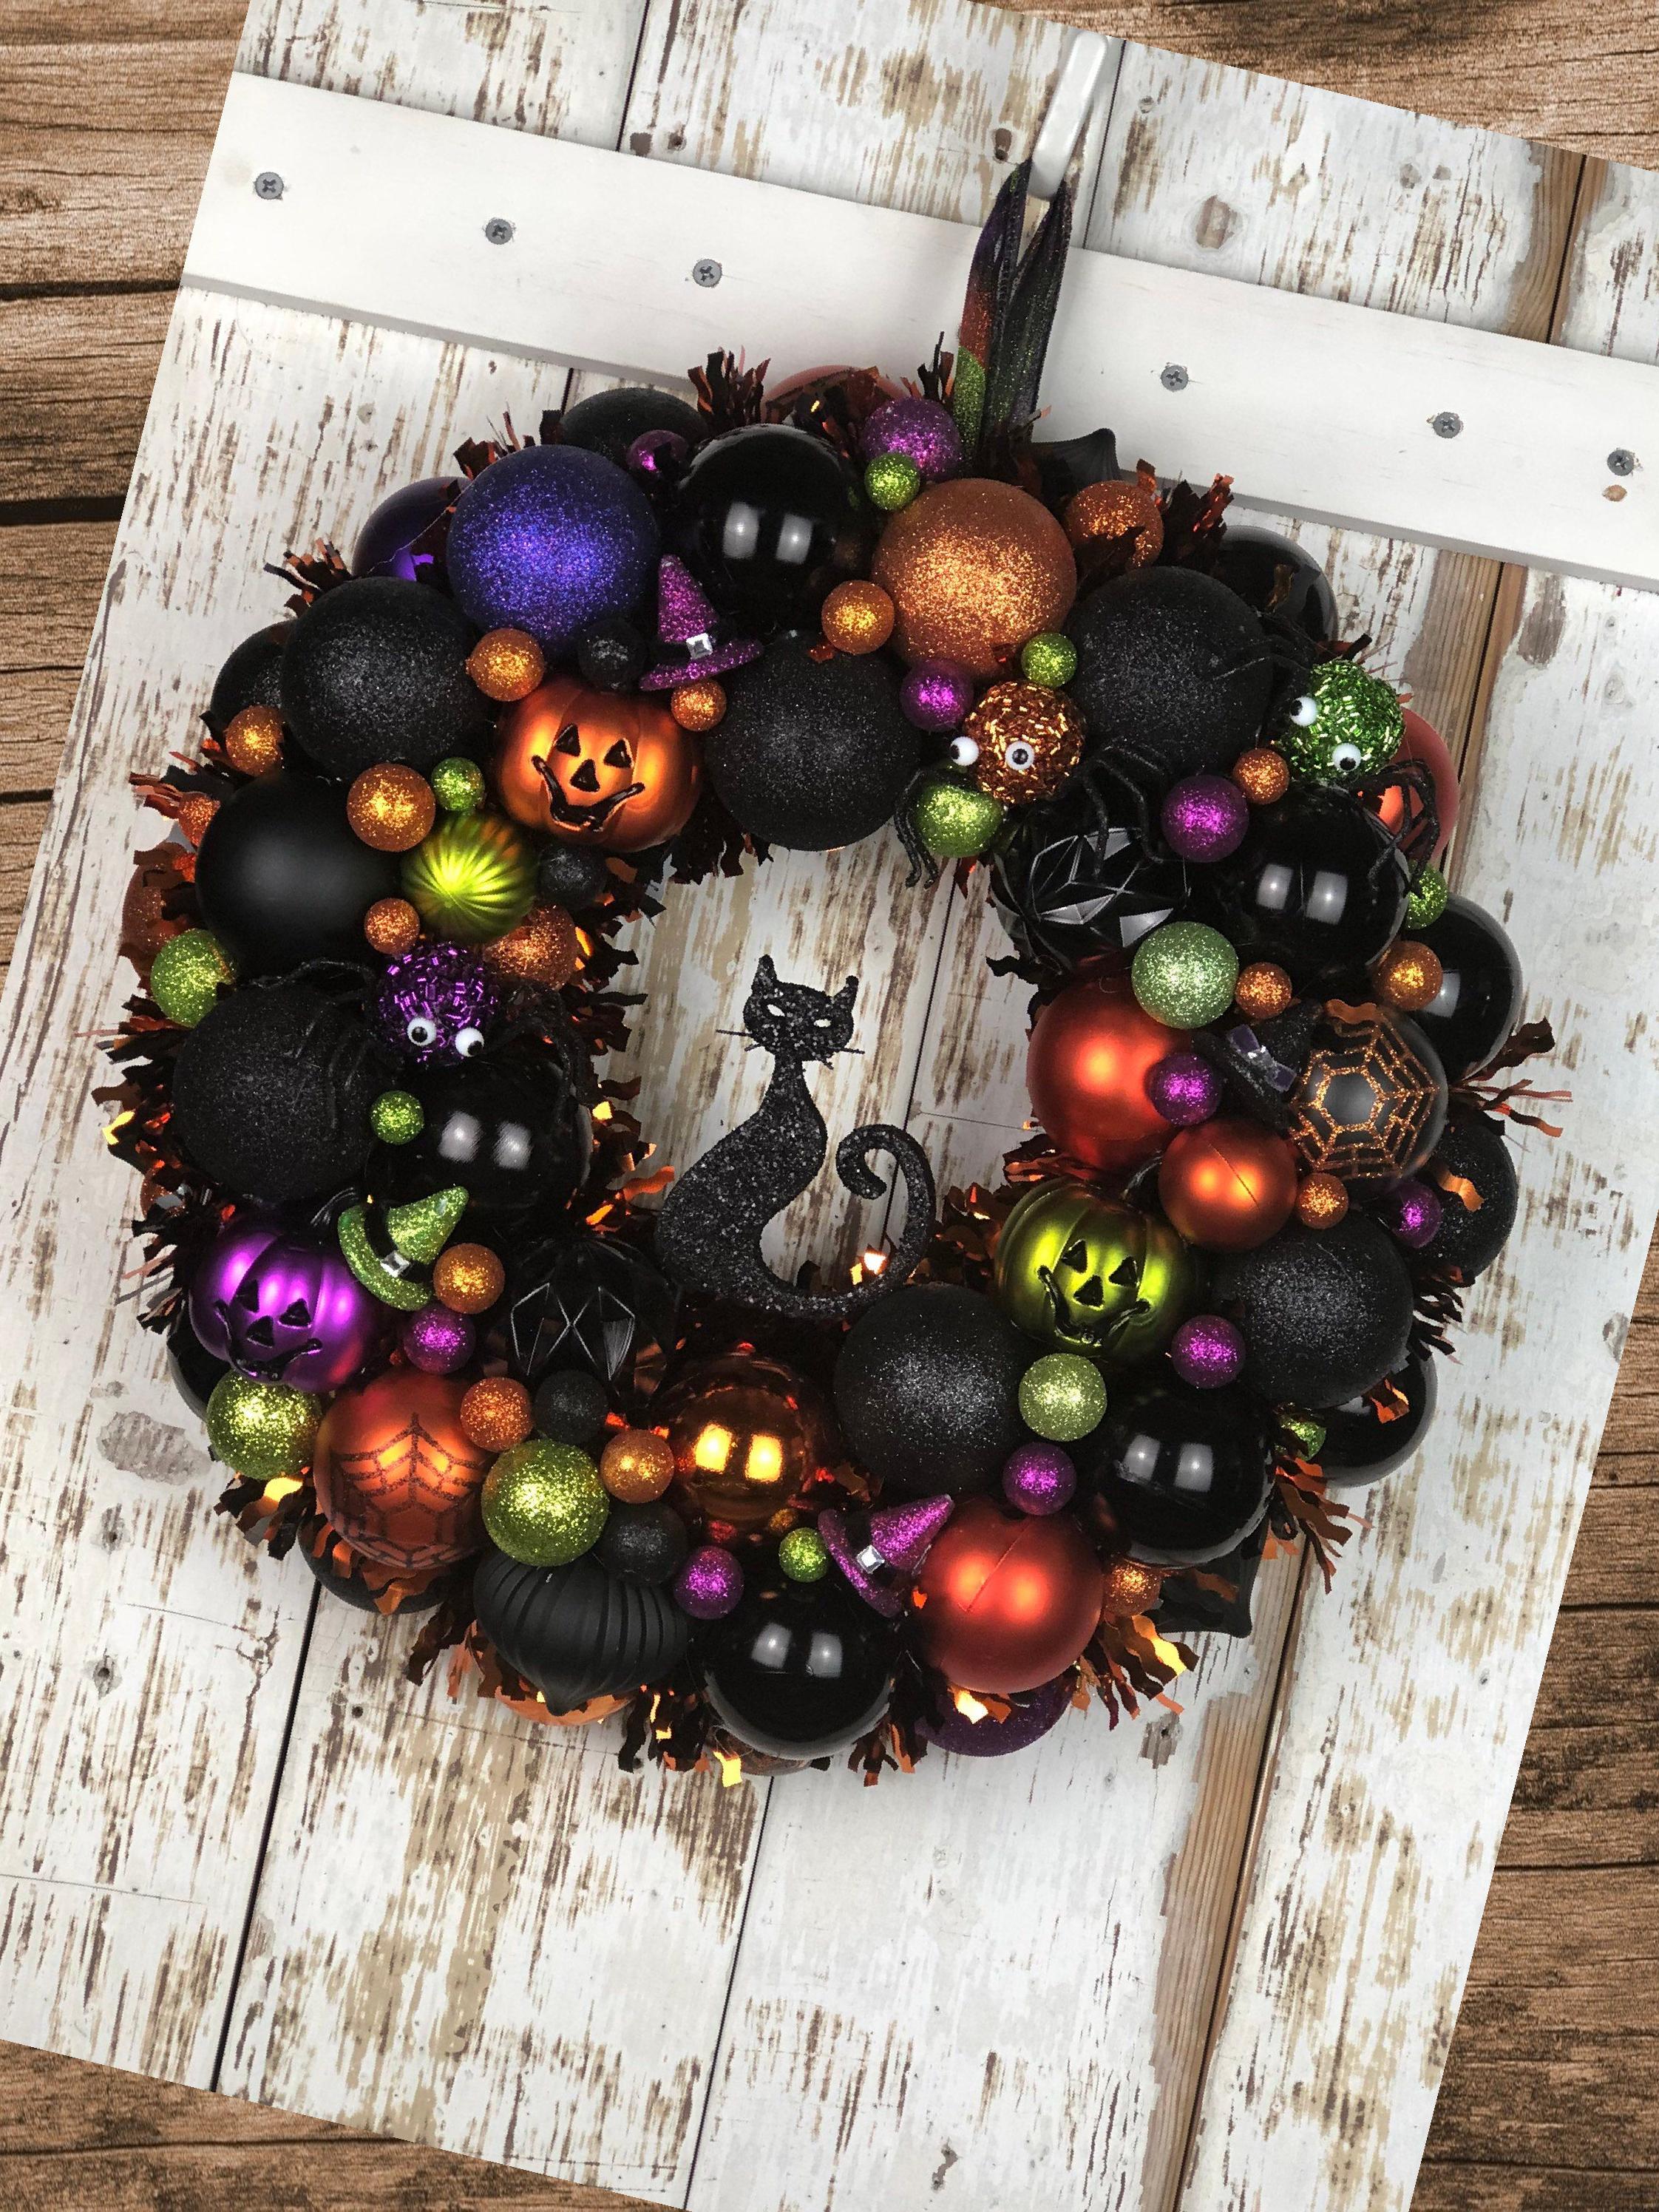 41 Halloween Wreath Ideas Halloween Wreath Diy Dollar Stores Diy Halloween Wreat Halloween Decorations Halloween Ornament Wreath Diy Halloween Decorations